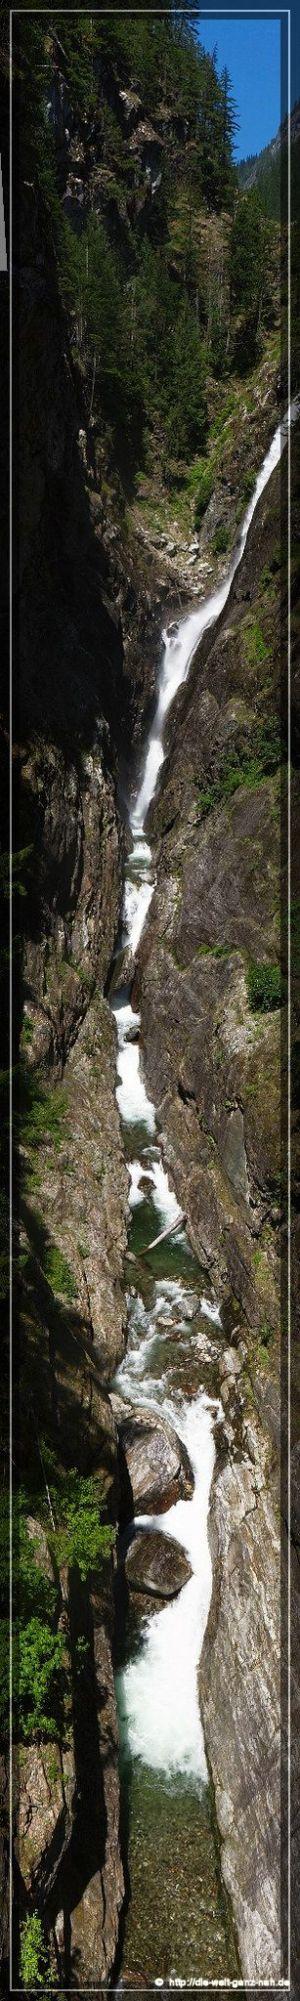 Comp Pano Cascades1 A 2